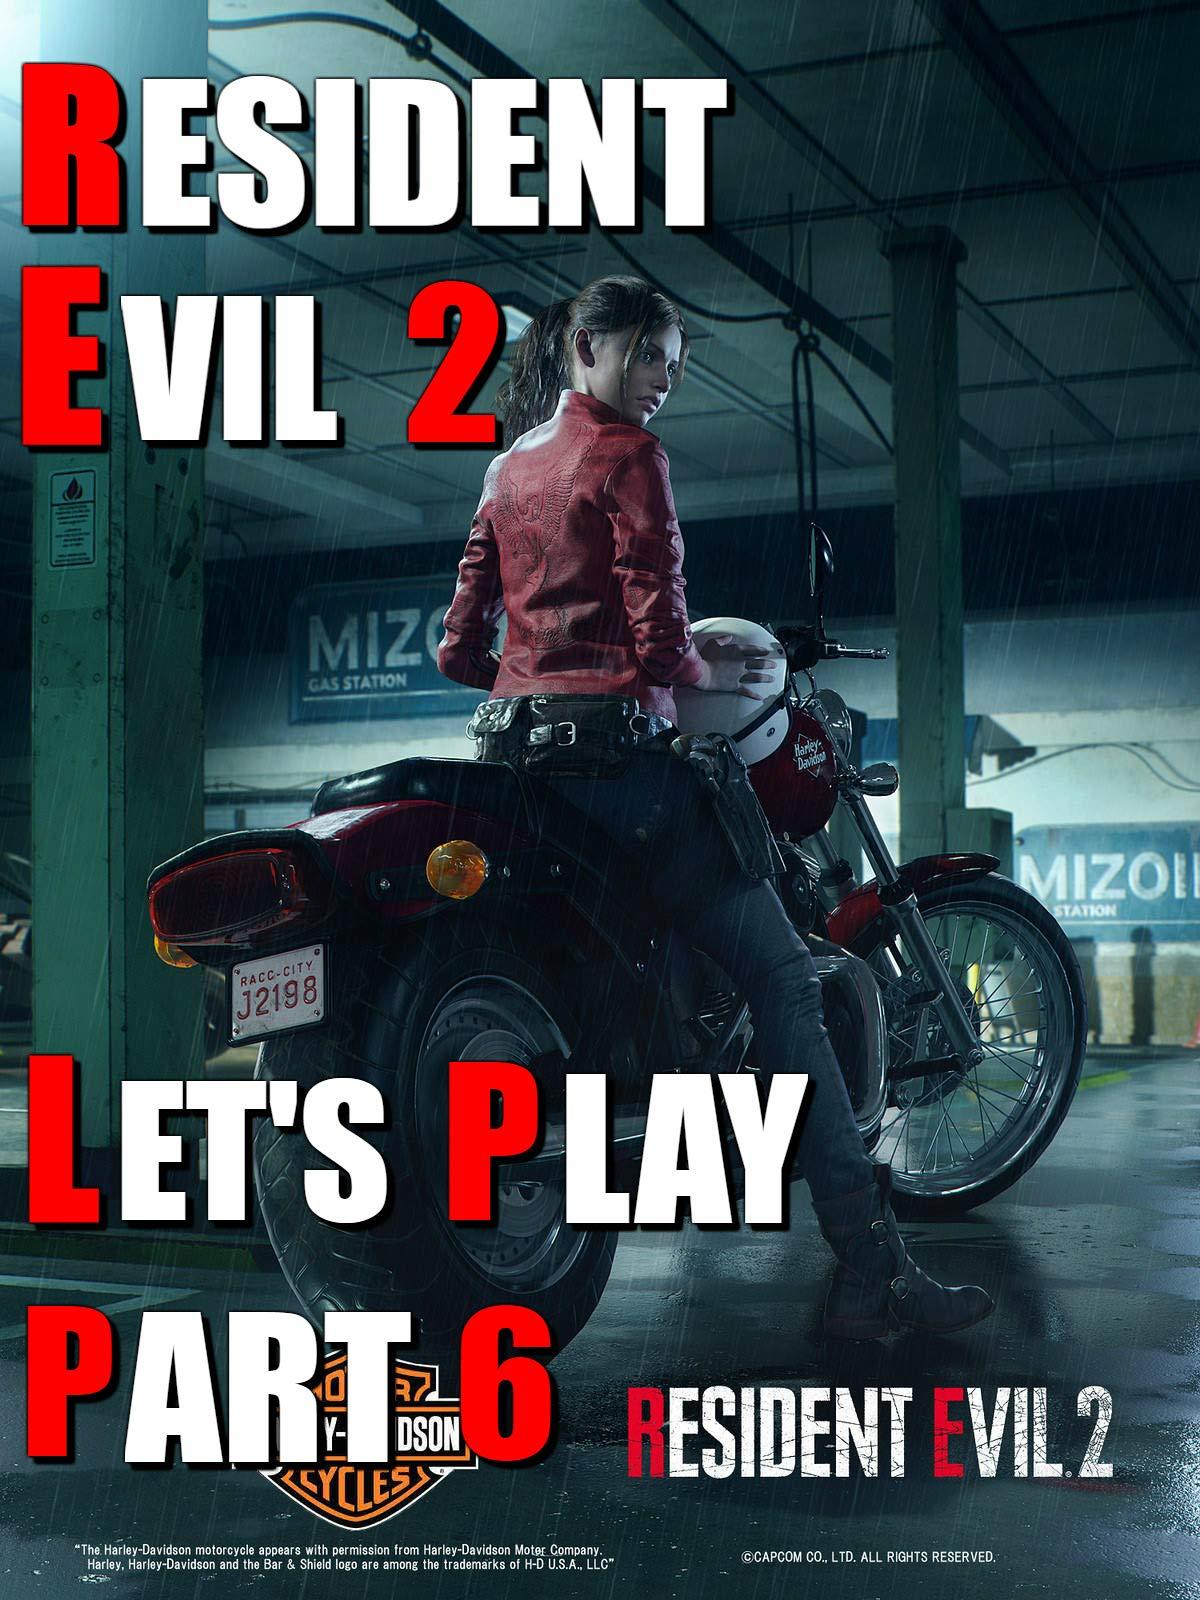 Resident Evil 2 | Let's Play | Part 6.